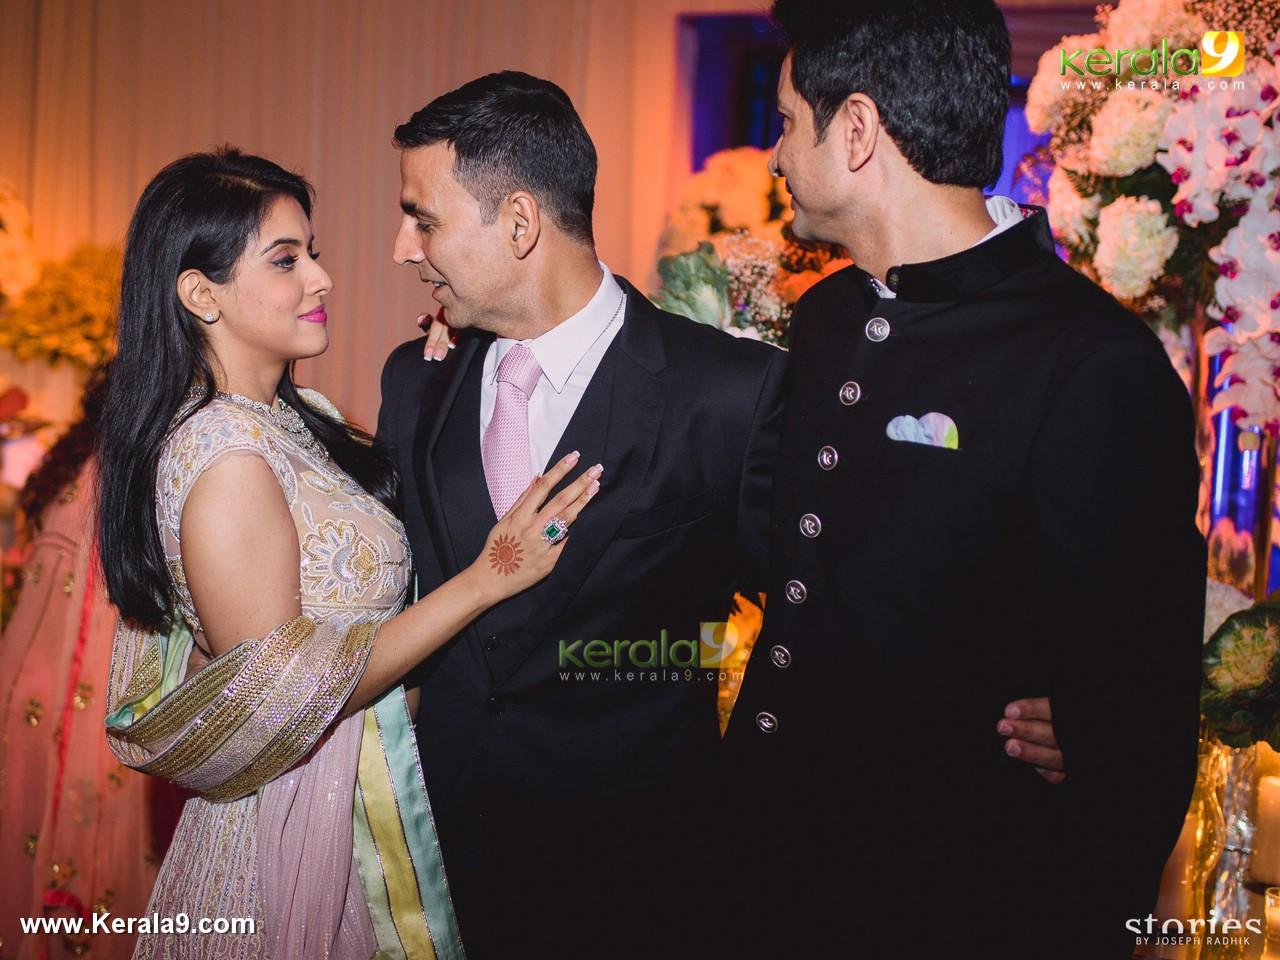 Actor asin wedding